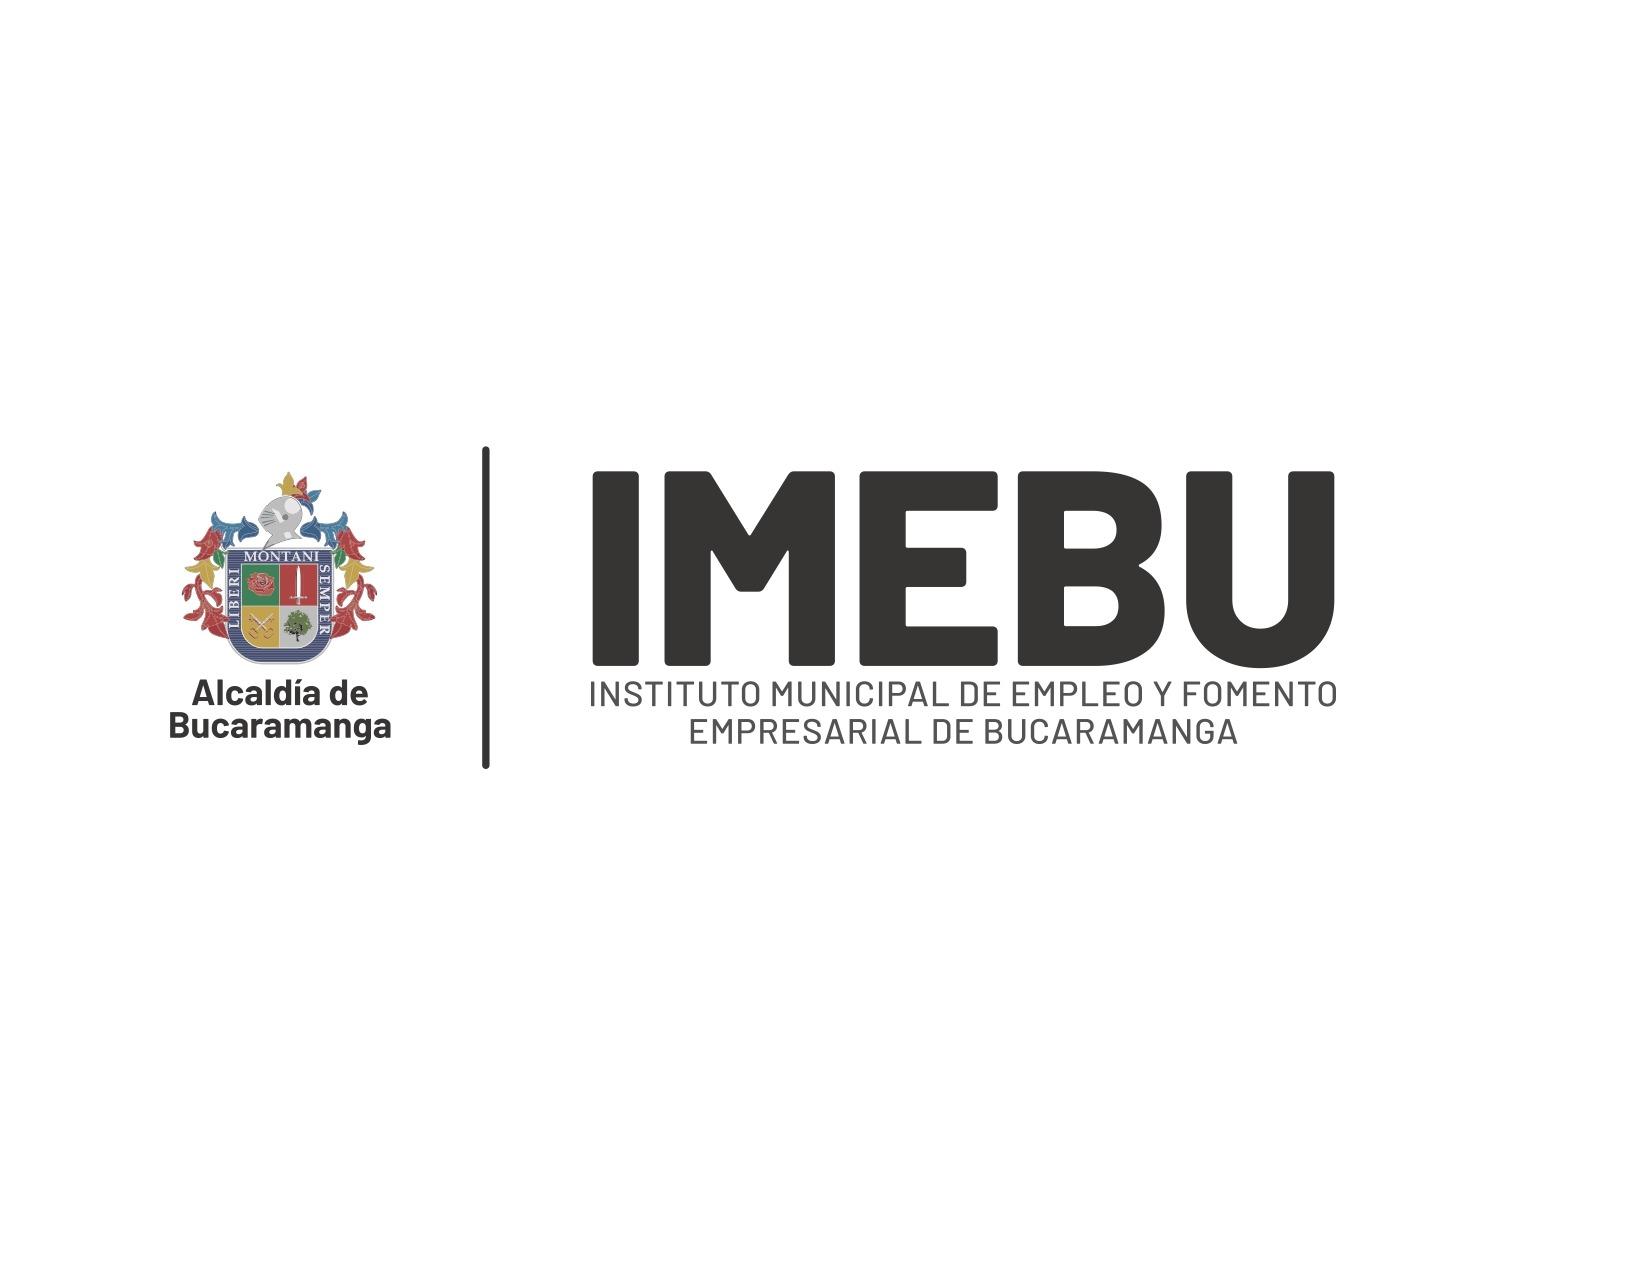 Instituto Municipal de Empleo y Fomento Empresarial de Bucaramanga – IMEBU Logo